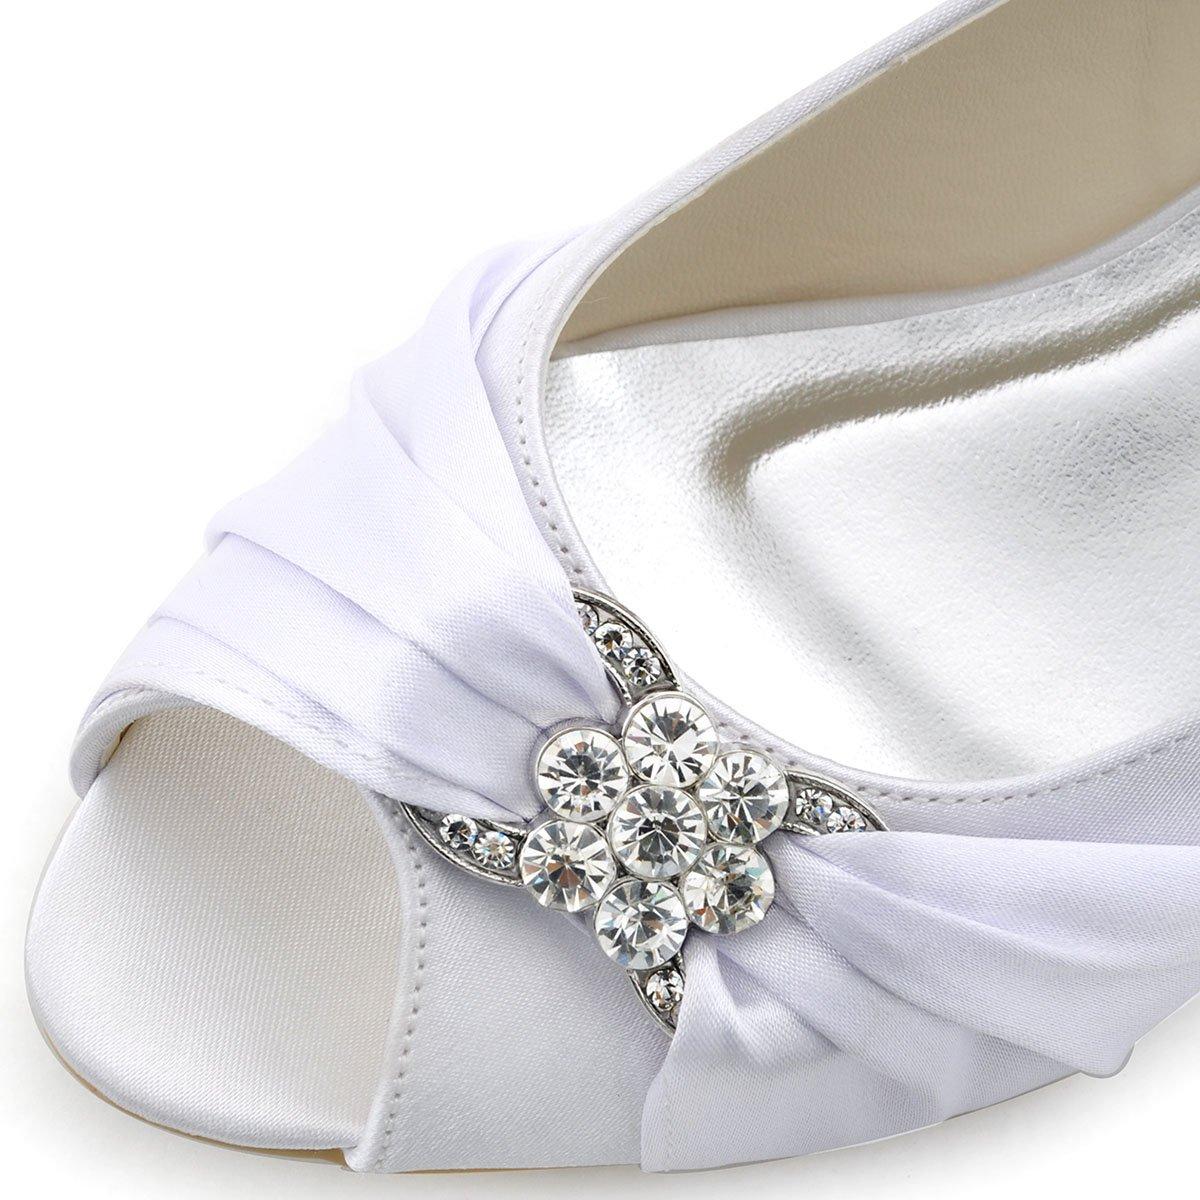 ElegantPark WP1403 Women Peep Toe Wedges Heel Rhinestones Satin Wedding  Bridal Shoes 7458f3c36bb6